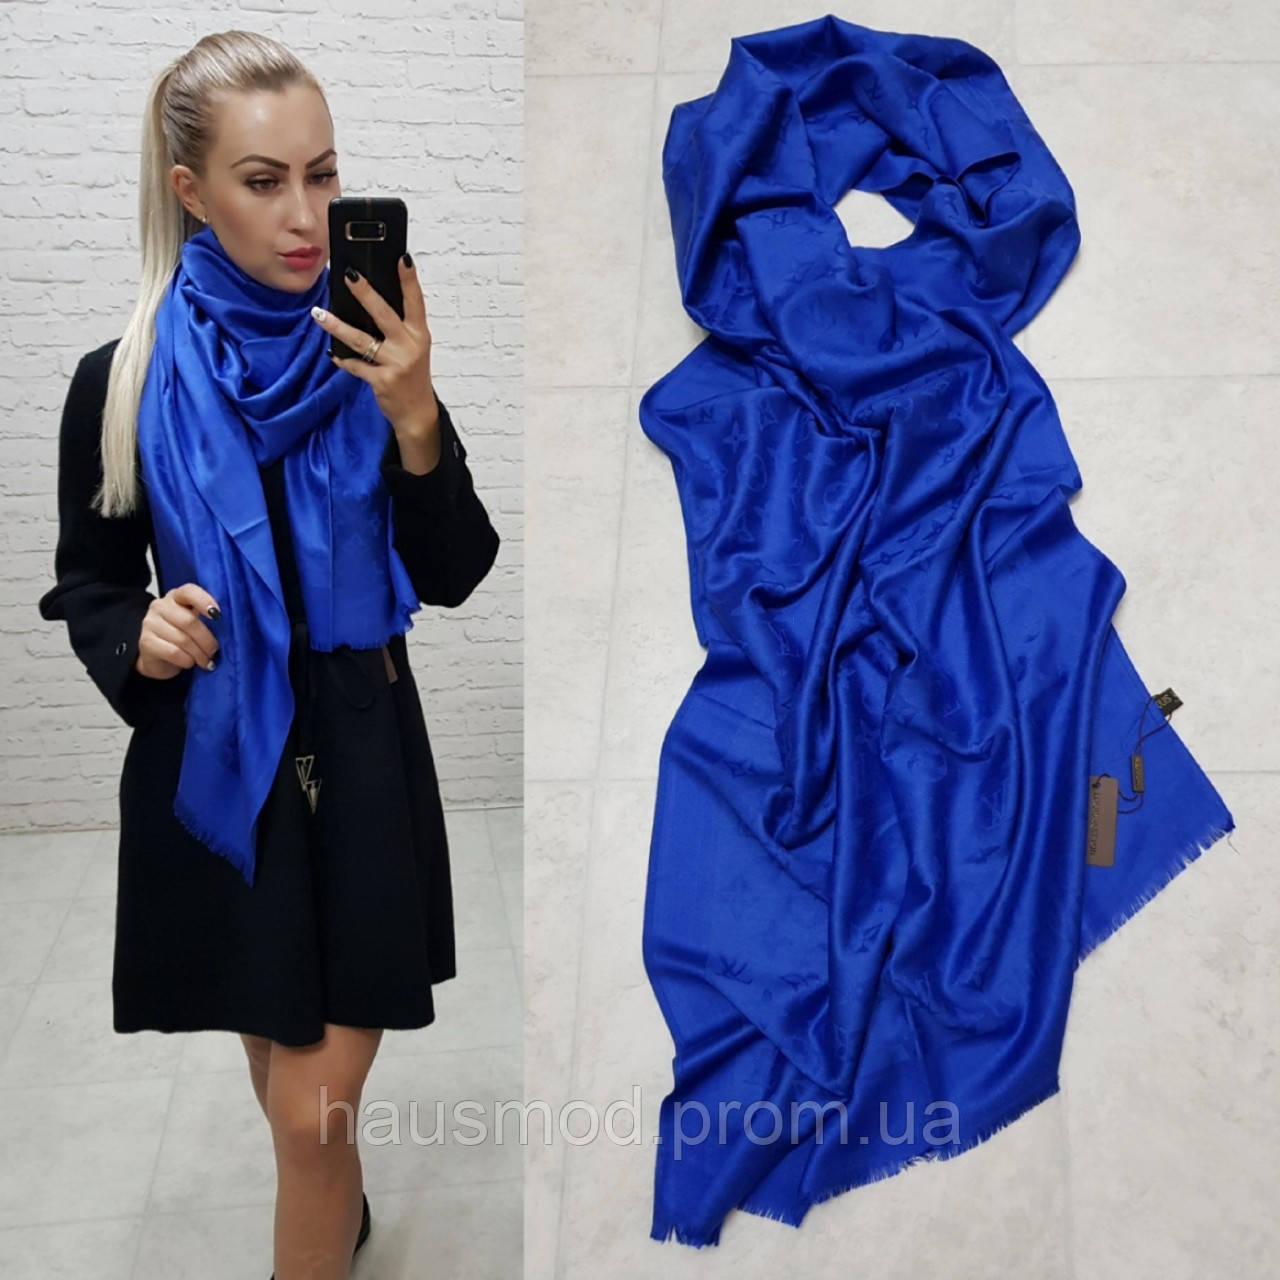 Женский палантин шарф реплика Louis Vuitton65% шелк 35% кашемир размер 190×0.70 см цвет синий-электрик